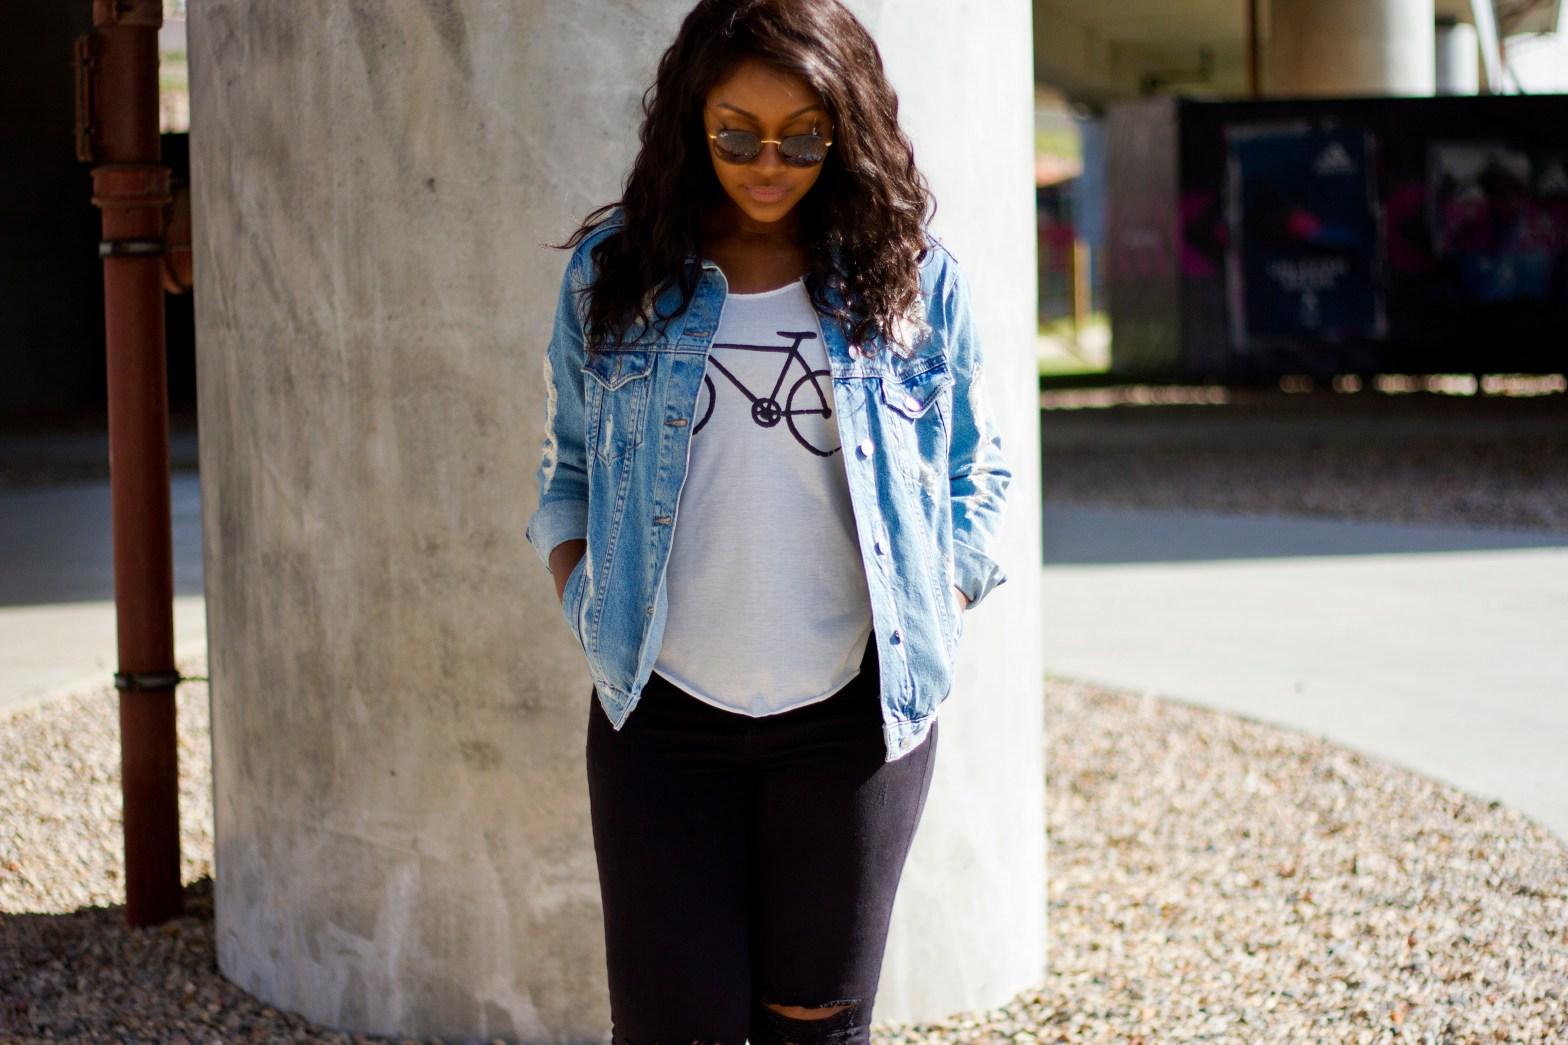 raychel-says-new-beginings-denim-jacket-white-top-black-jeans-converse